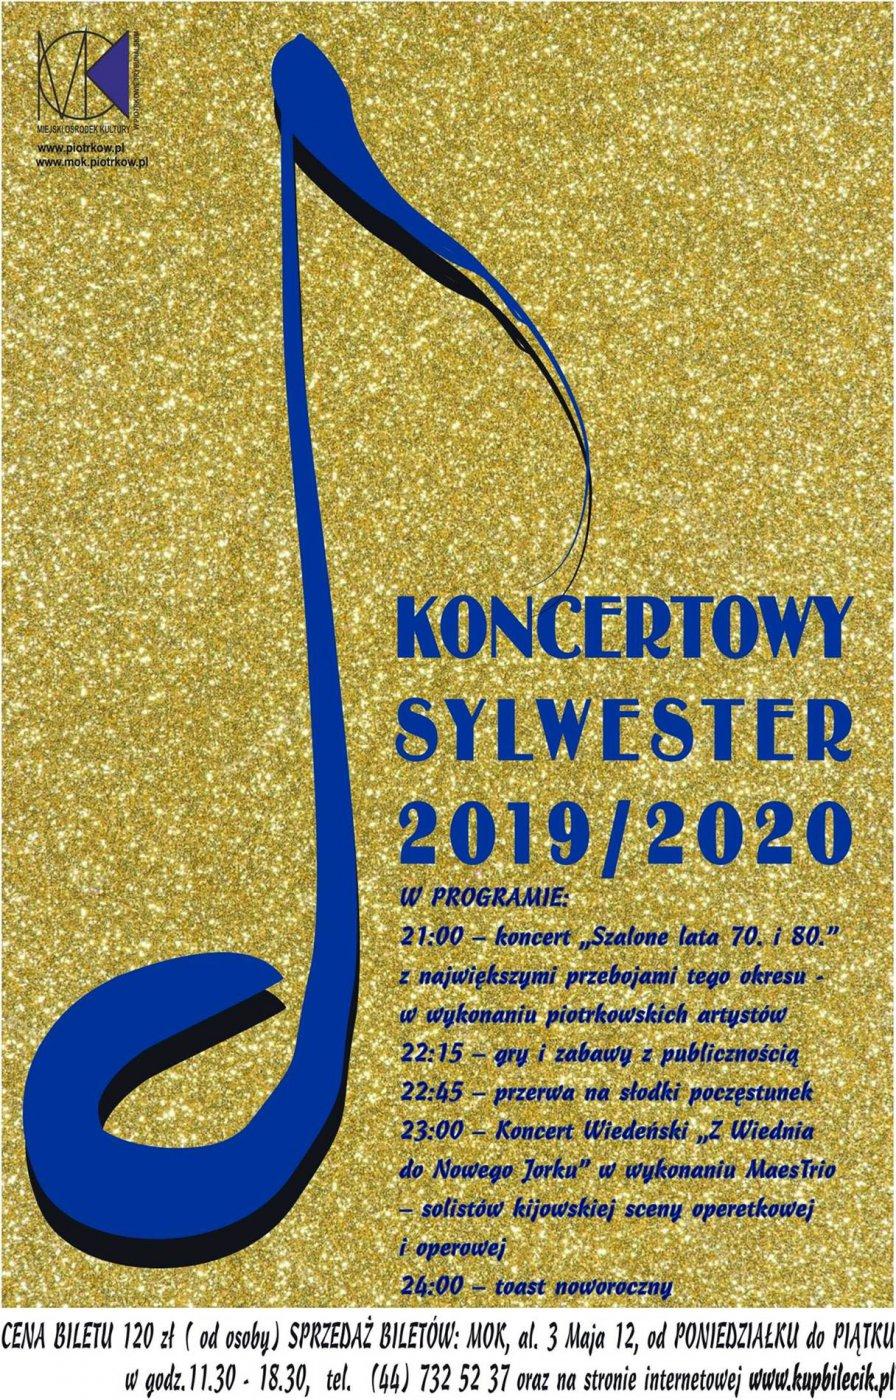 Koncertowy Sylwester 2019/2020